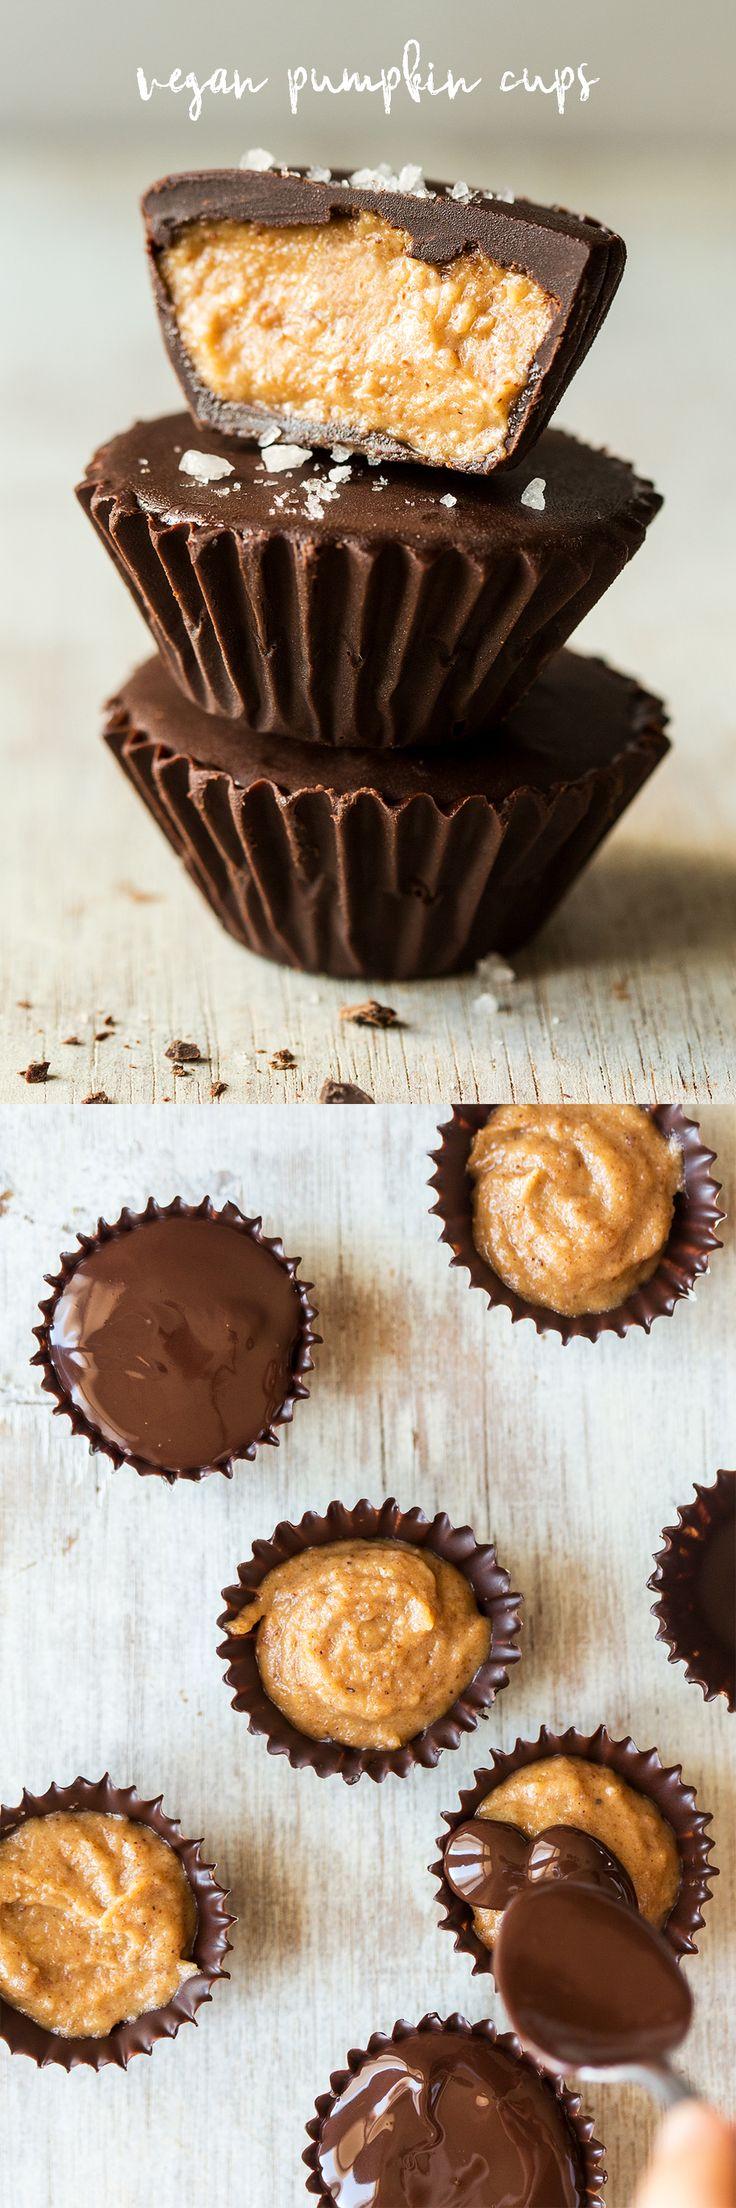 #sweets #vegan #dairyfree #pumpkin #chocolatecups #dessert #desserts #treat #xmas #christmas #spicedpumpkin #pumpkinspice #chocolate